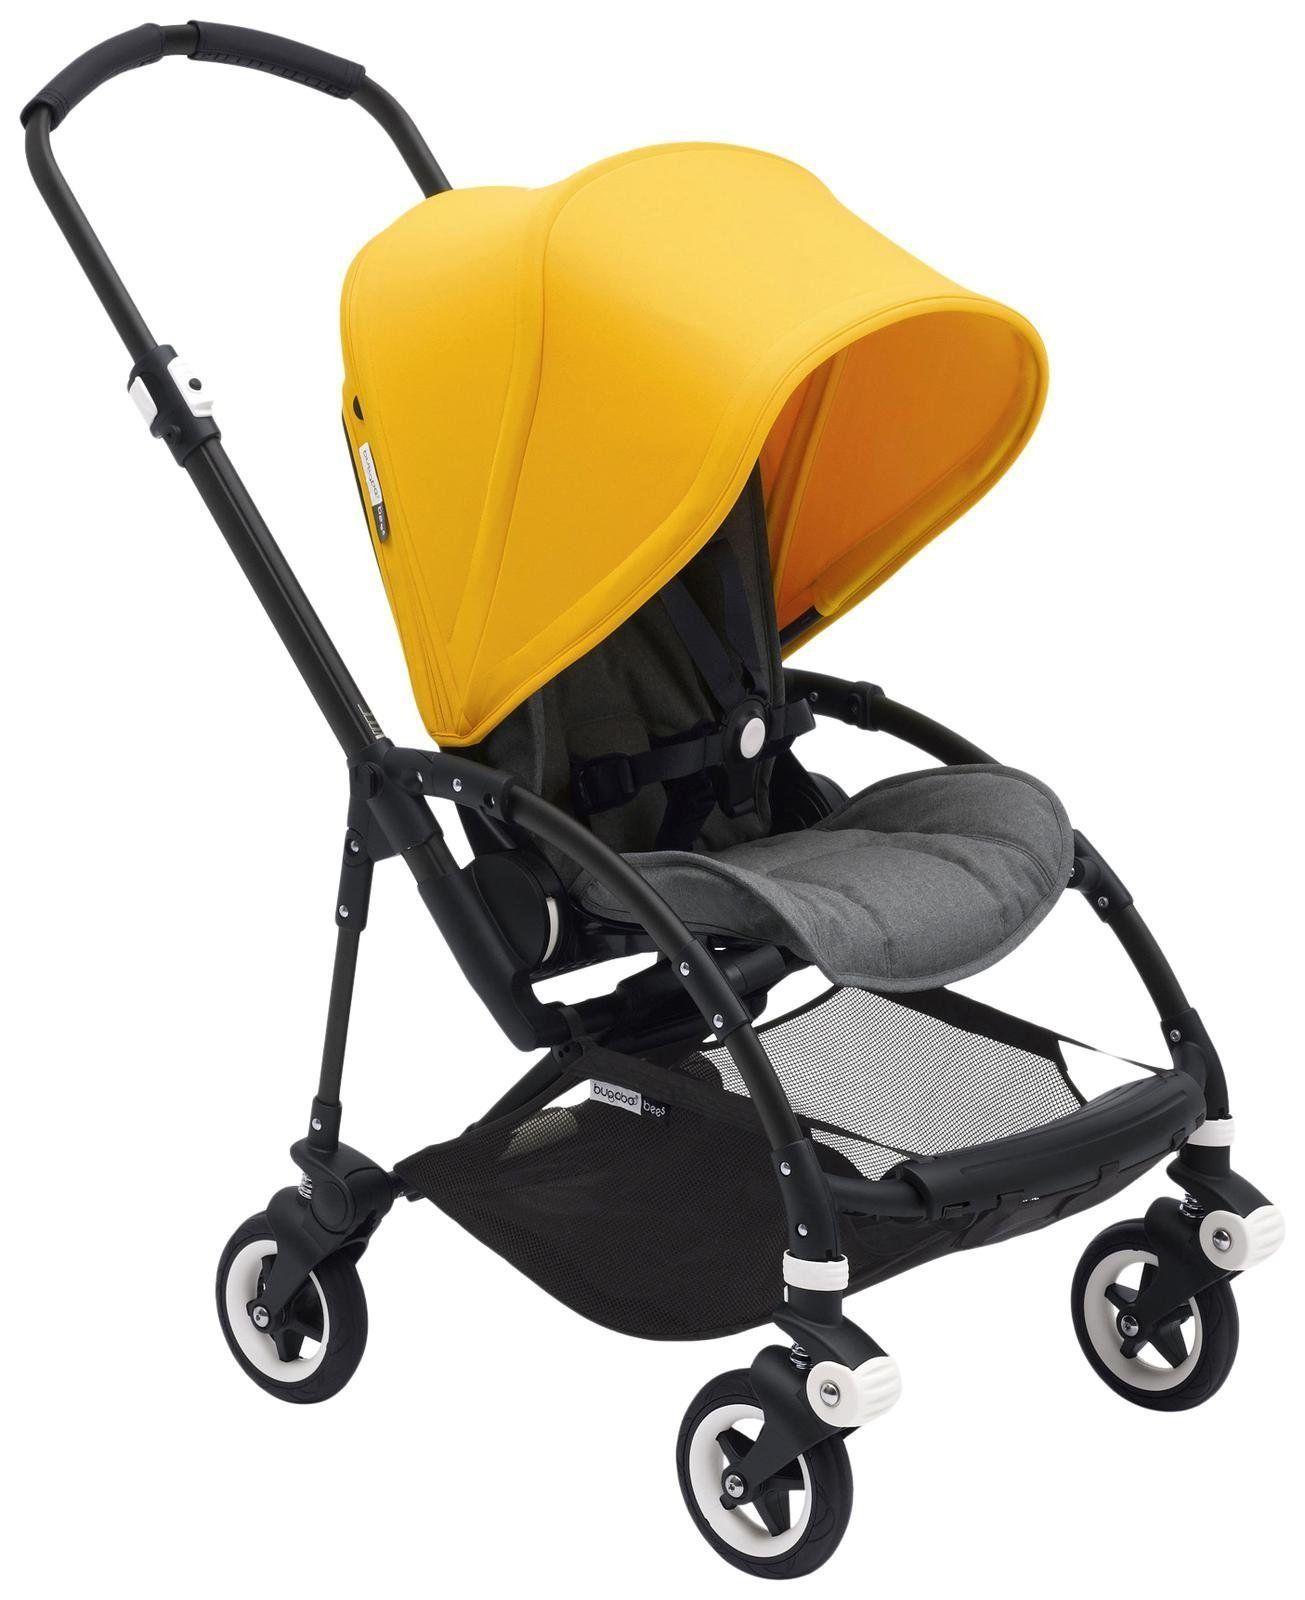 Bugaboo Bee5 Complete Stroller, Black/Sunrise Yellow